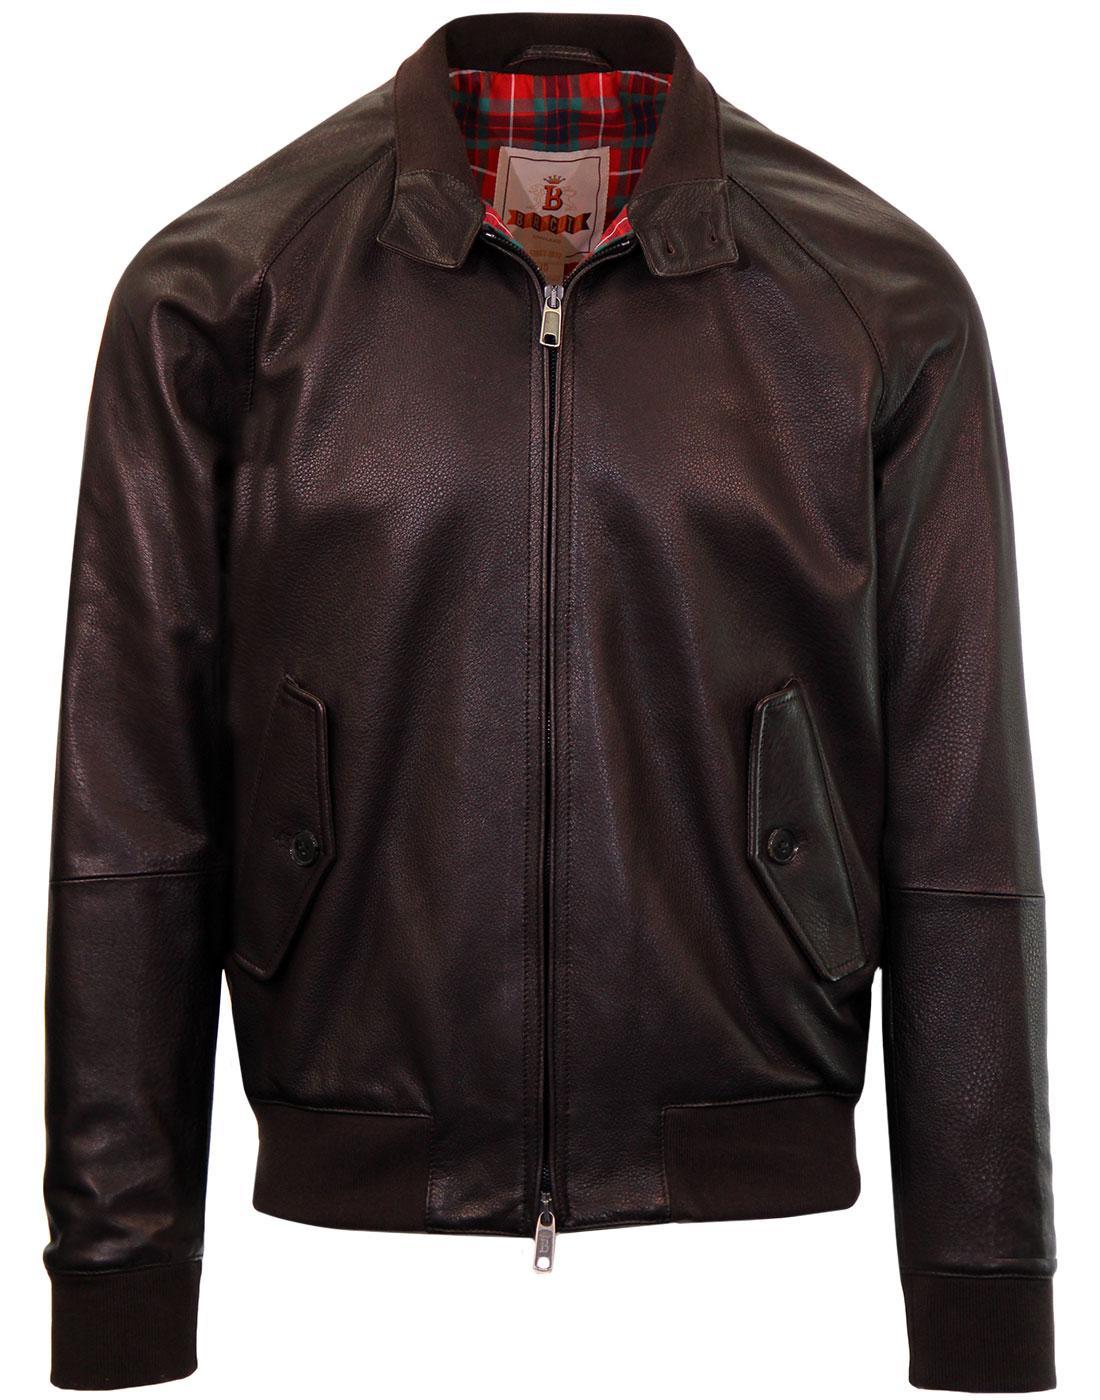 BARACUTA G9 Italian Leather Harrington Jacket (DB)